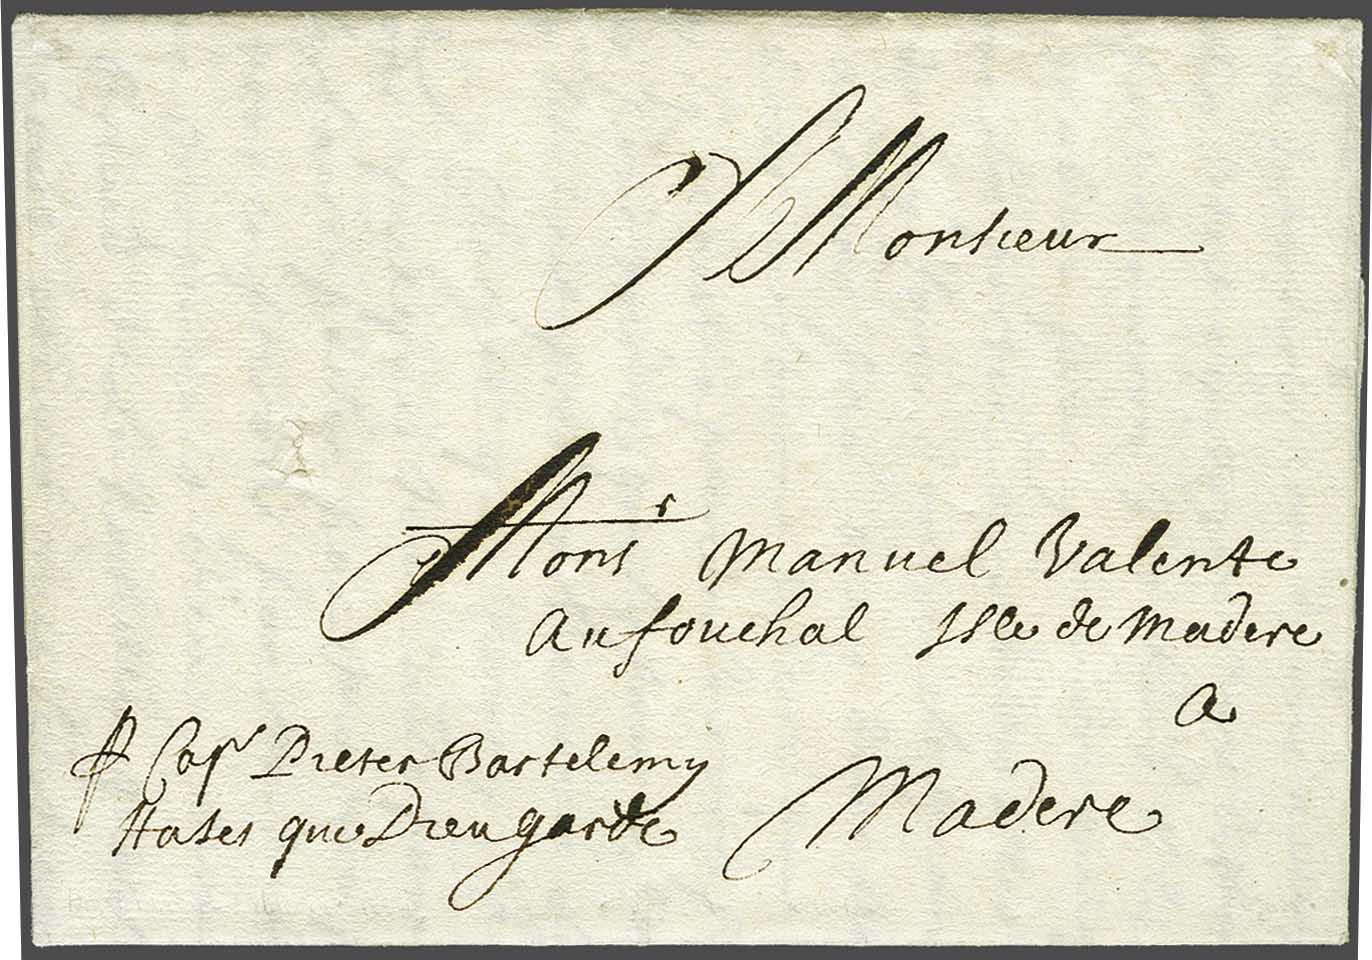 Lot 19 - Netherlands and former colonies Netherlands -  Corinphila Veilingen Auction 240: Single lots Netherlands and former colonies